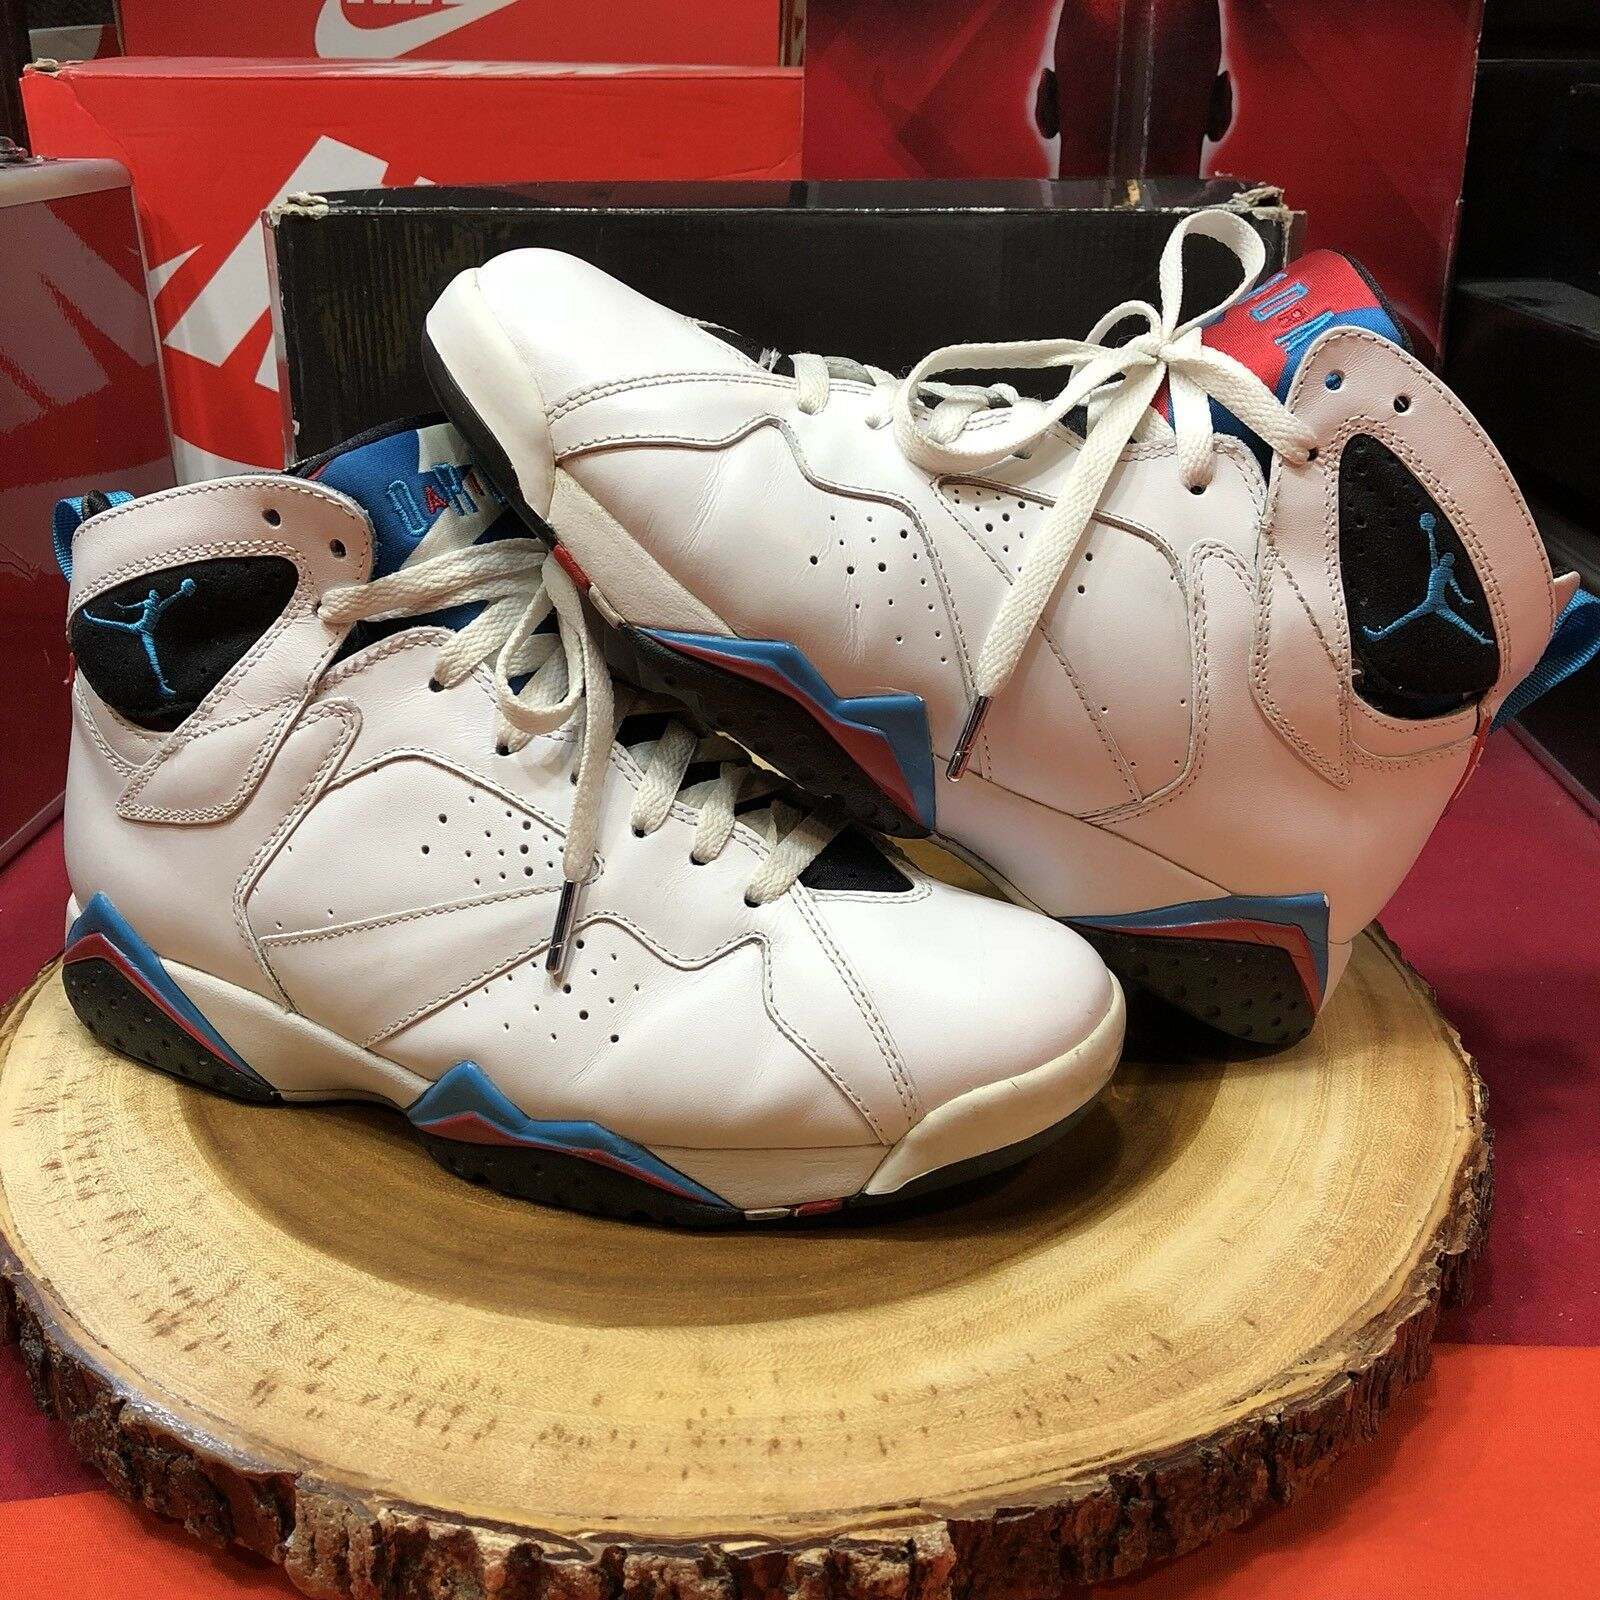 Nike air jordan / vii 7 retro bianco / jordan blu e nero infrarossi 304775-105 taglia 9 orion d66698